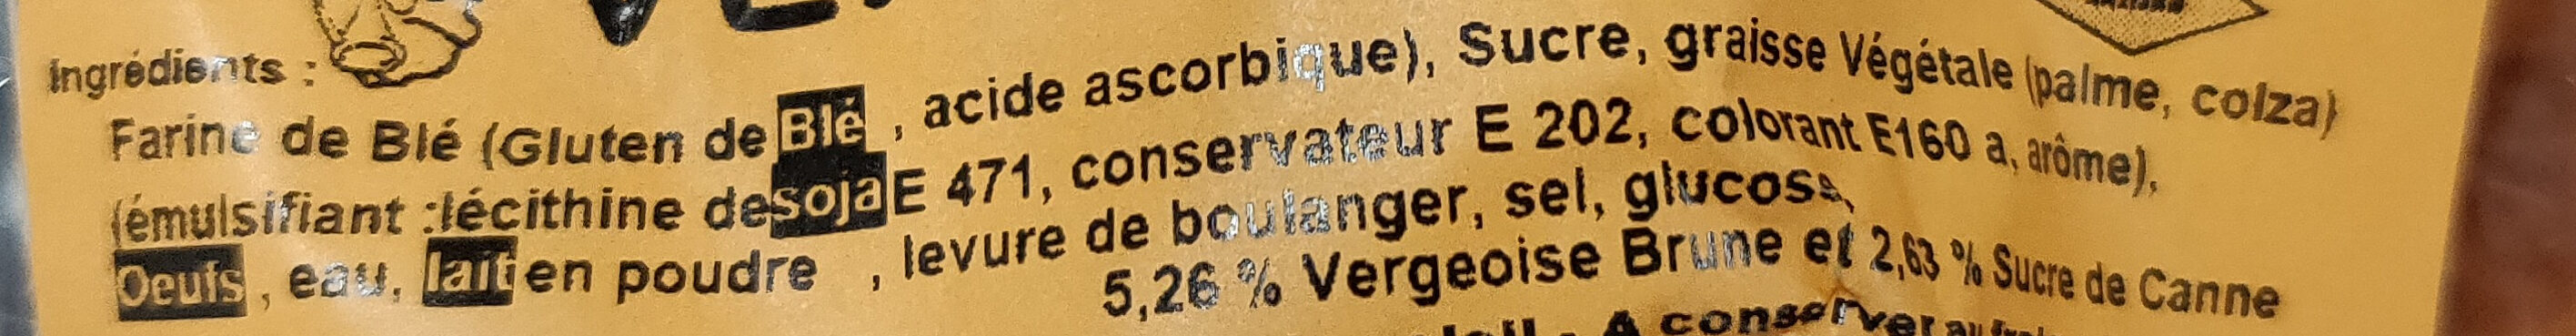 Gaufres maison vergeoise - Ingrédients - fr